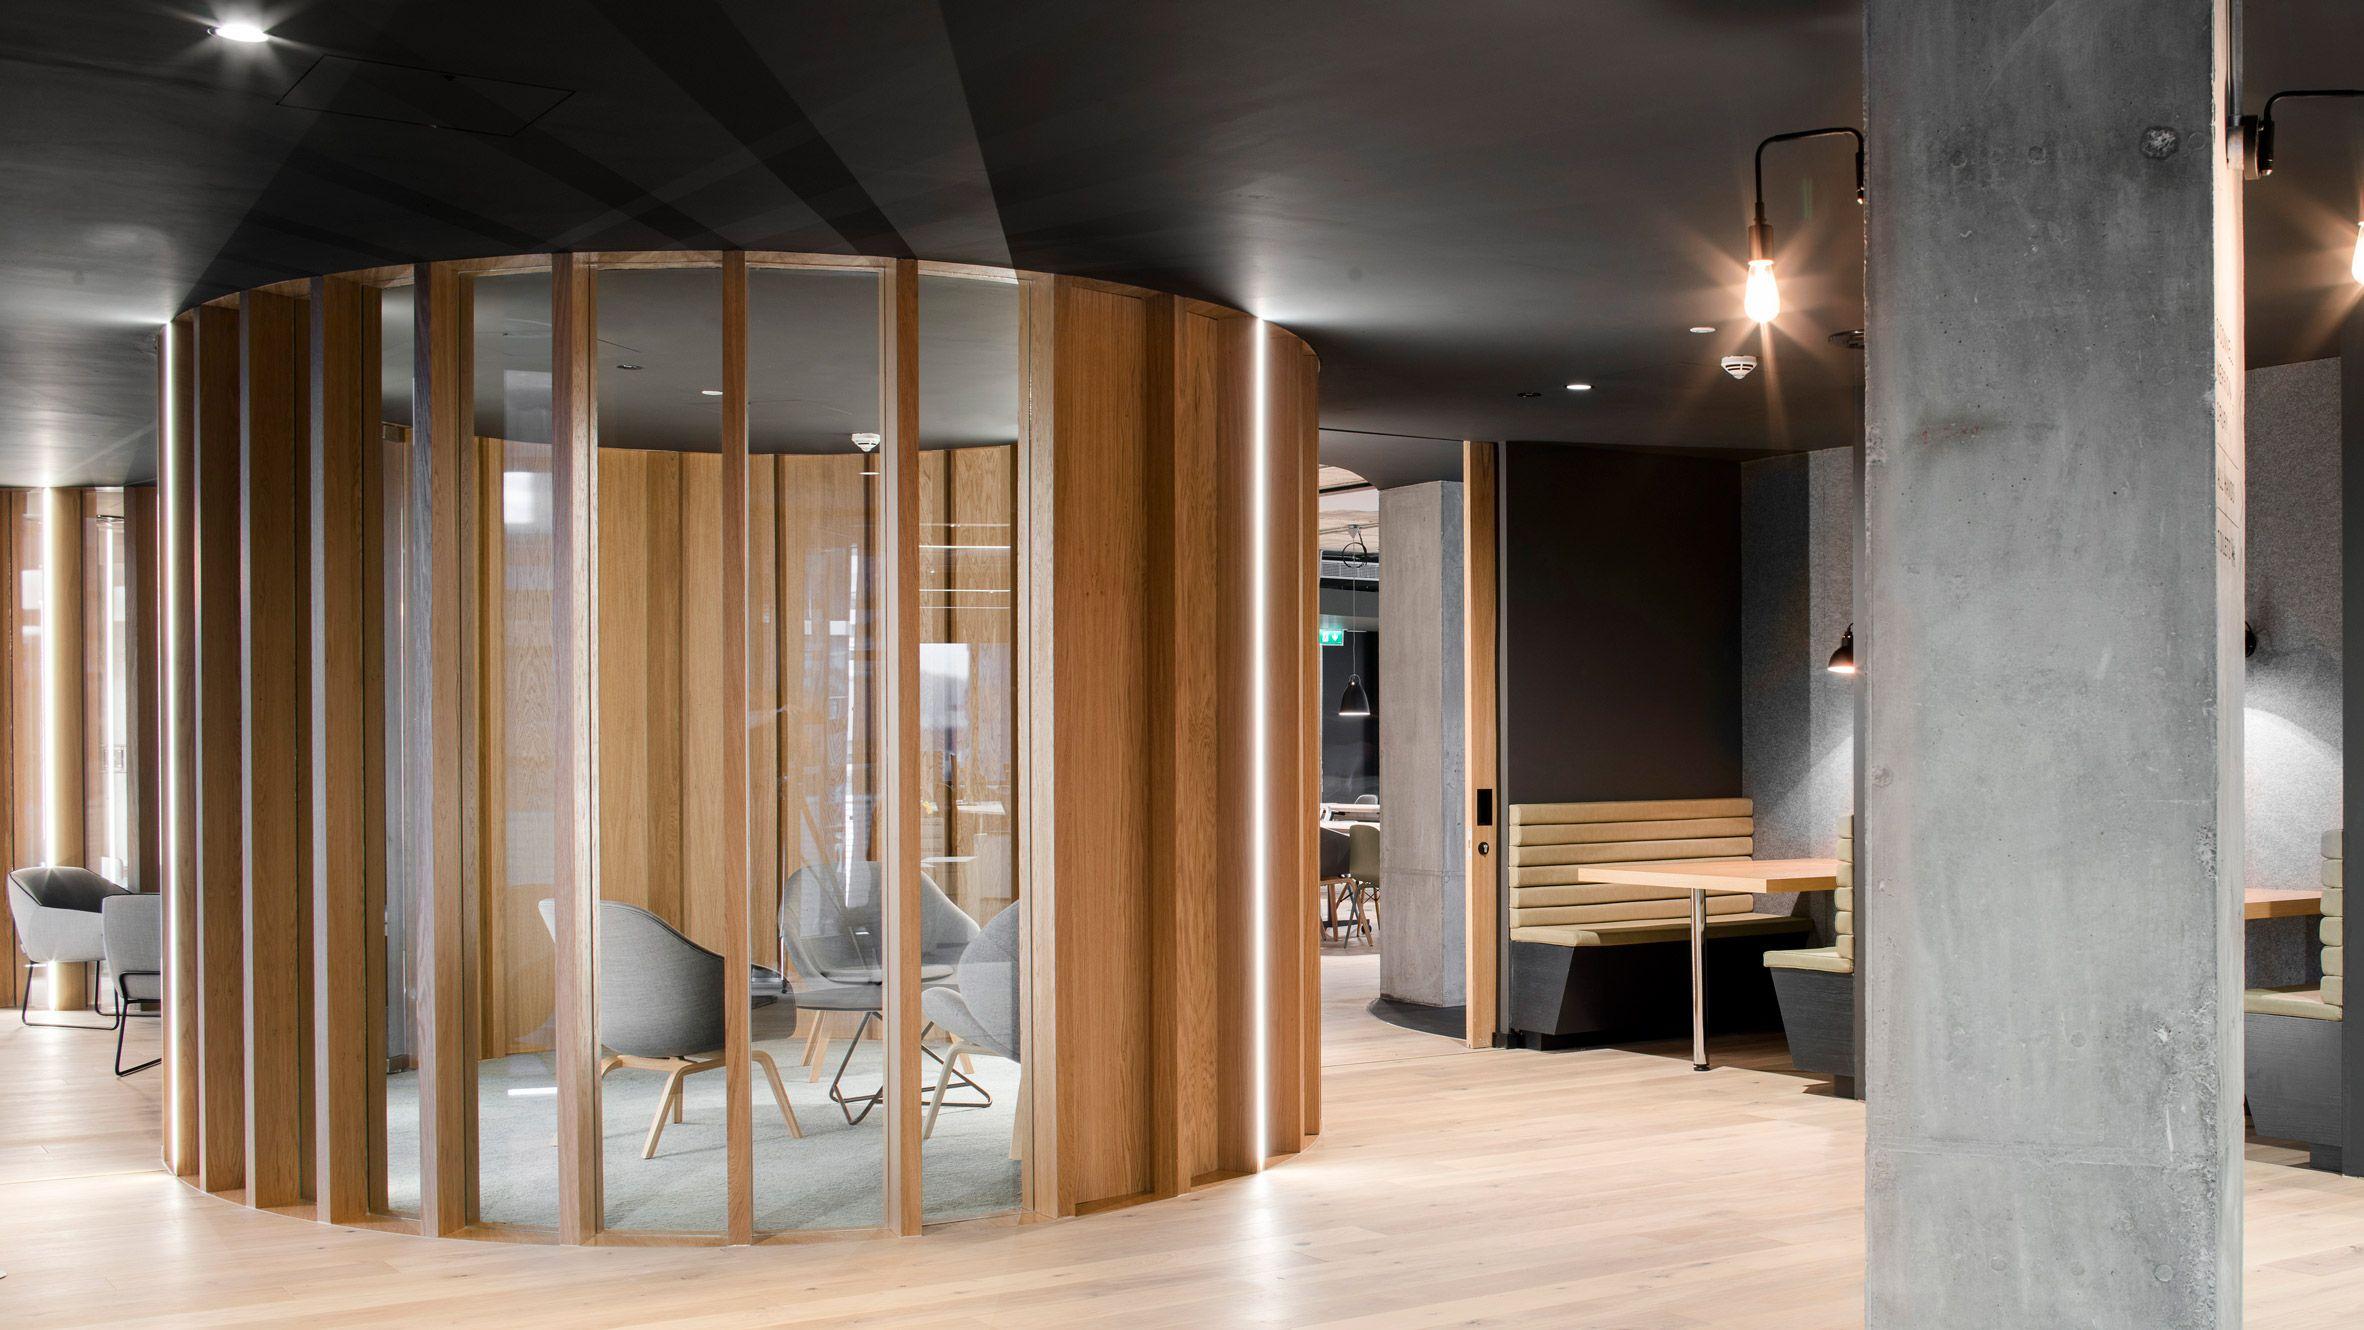 Slack S European Headquarters Eschews Bright Colours Of Tech Start Up Offices Interior Design Trends 2017 Dark Interiors Office Interior Design